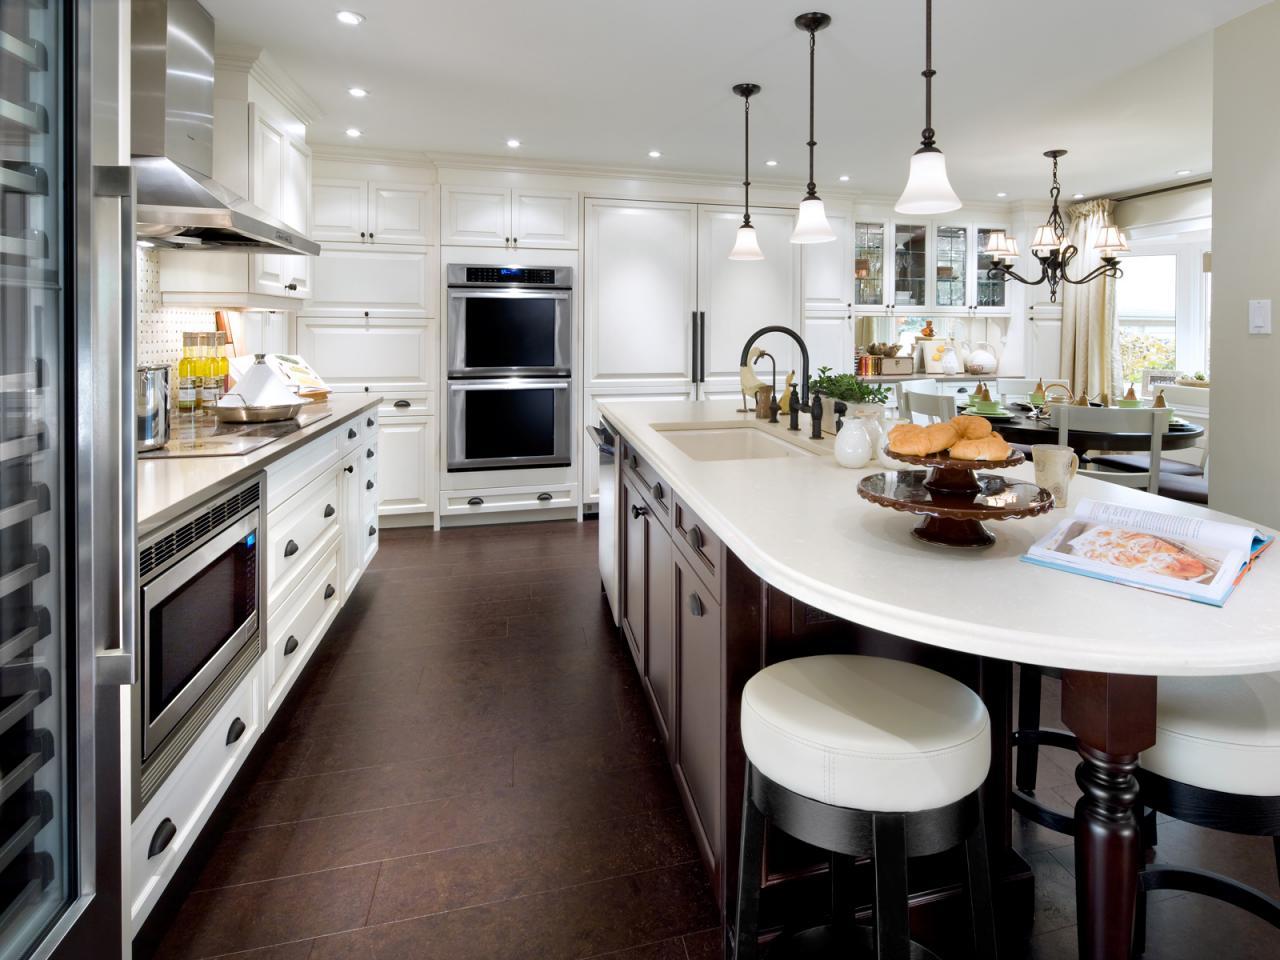 candice olson kitchen design pictures photo - 1